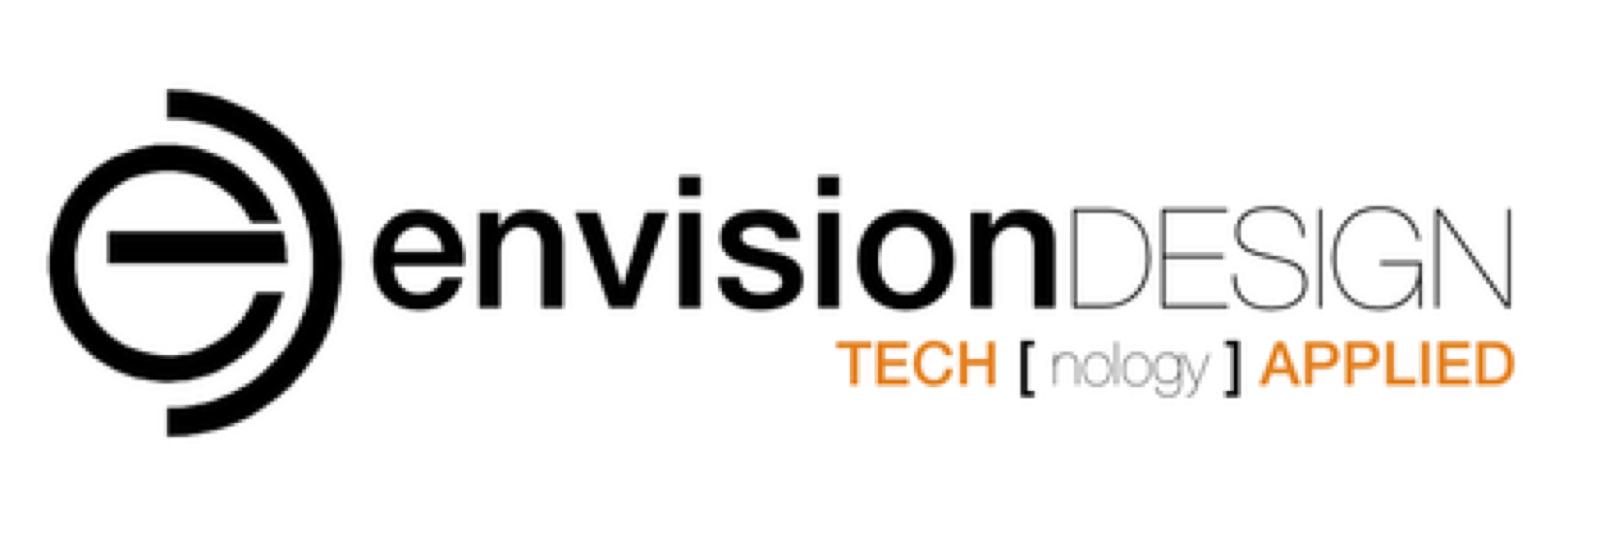 Envision Design.jpg